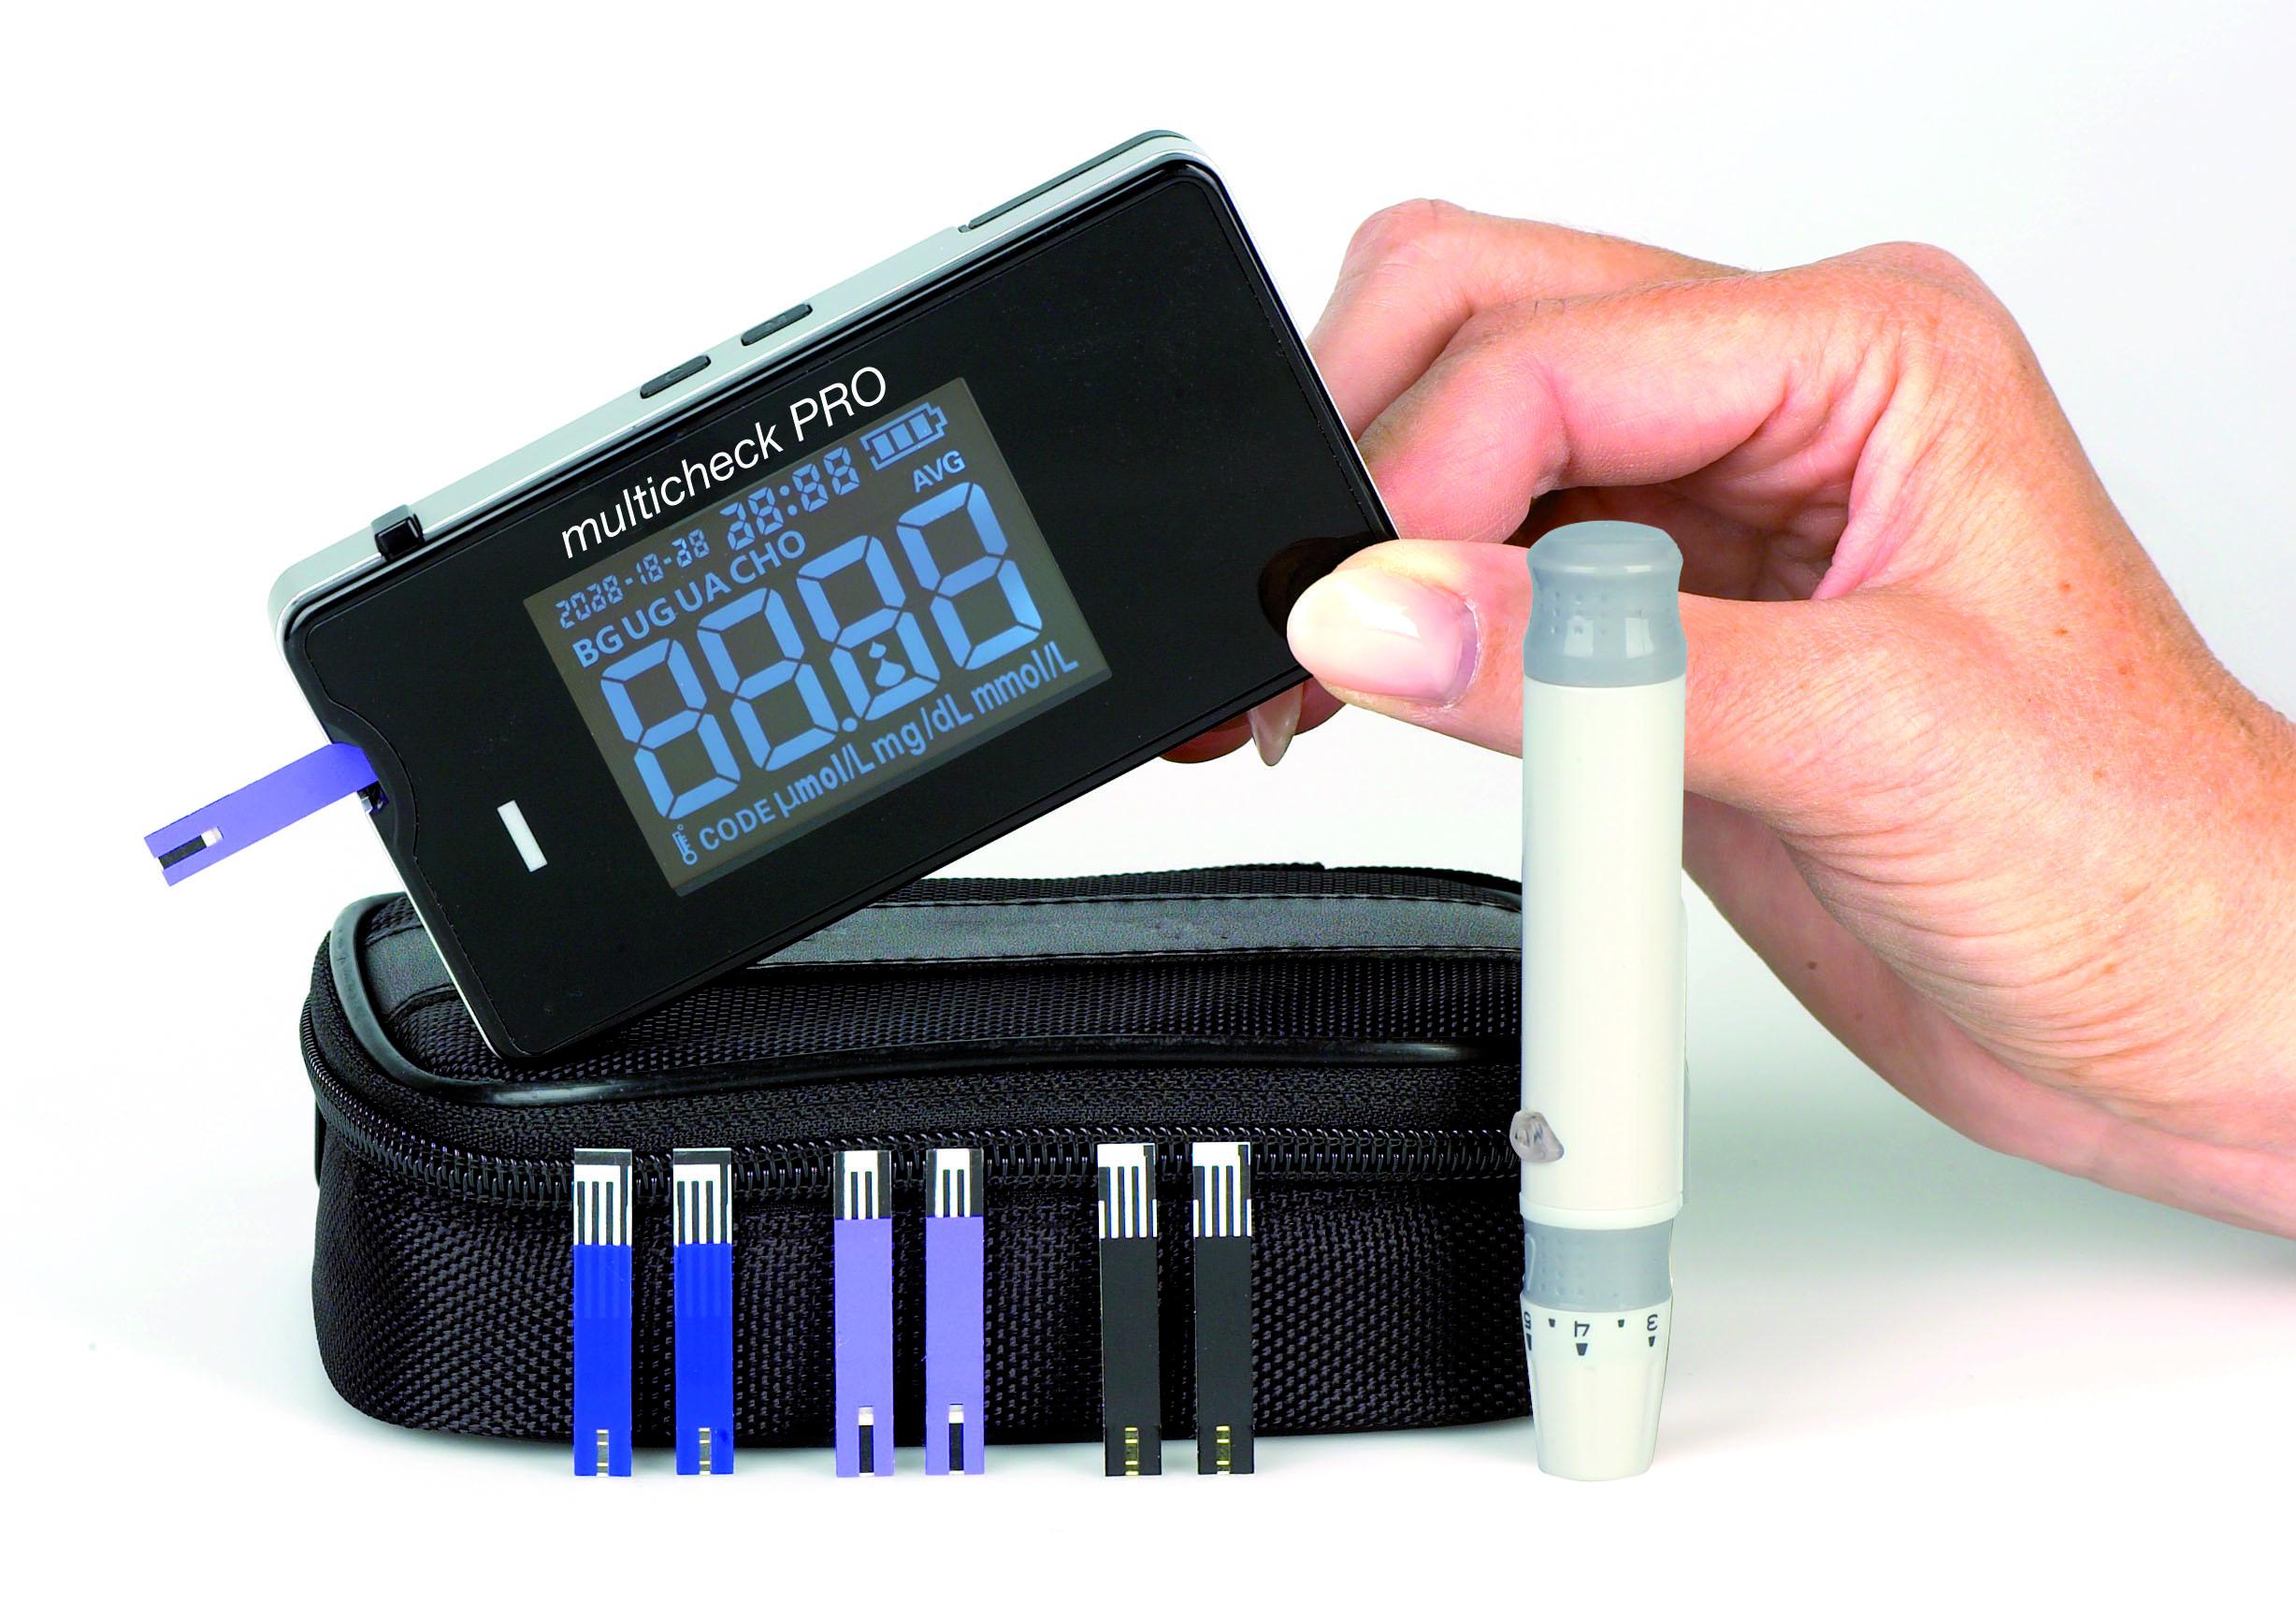 Multicheck PRO Cholesterol Sensoren, 25 Stück